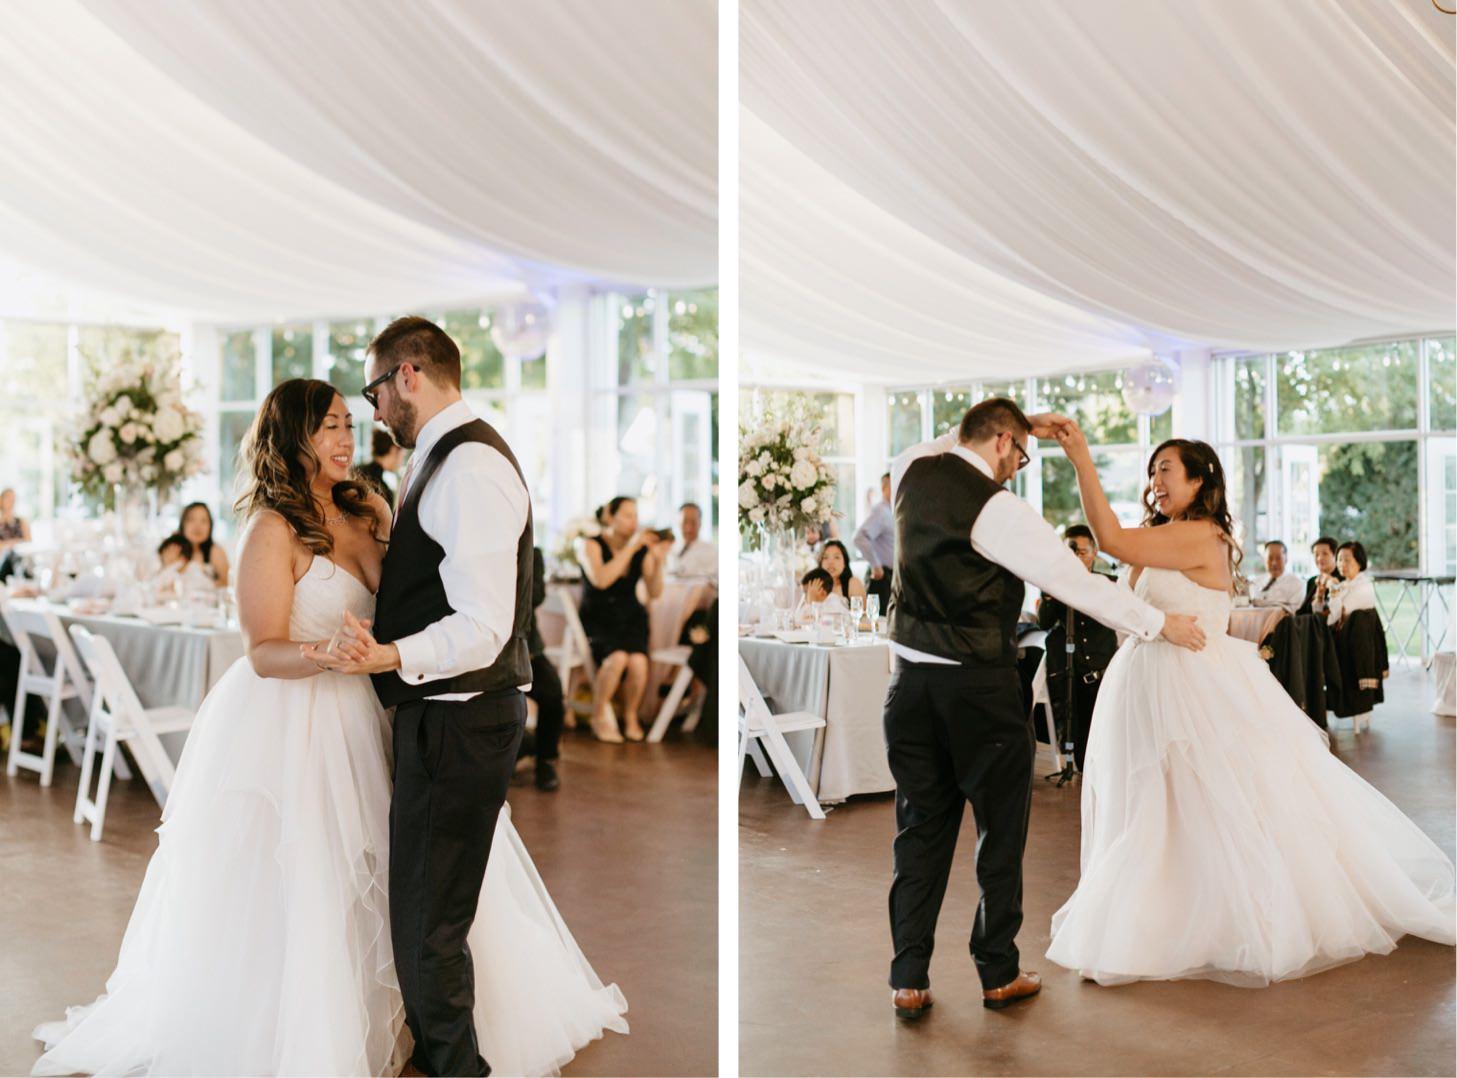 ritz-charles-wedding-reception-downtown-indianapolis-wedding-photographer048.JPG